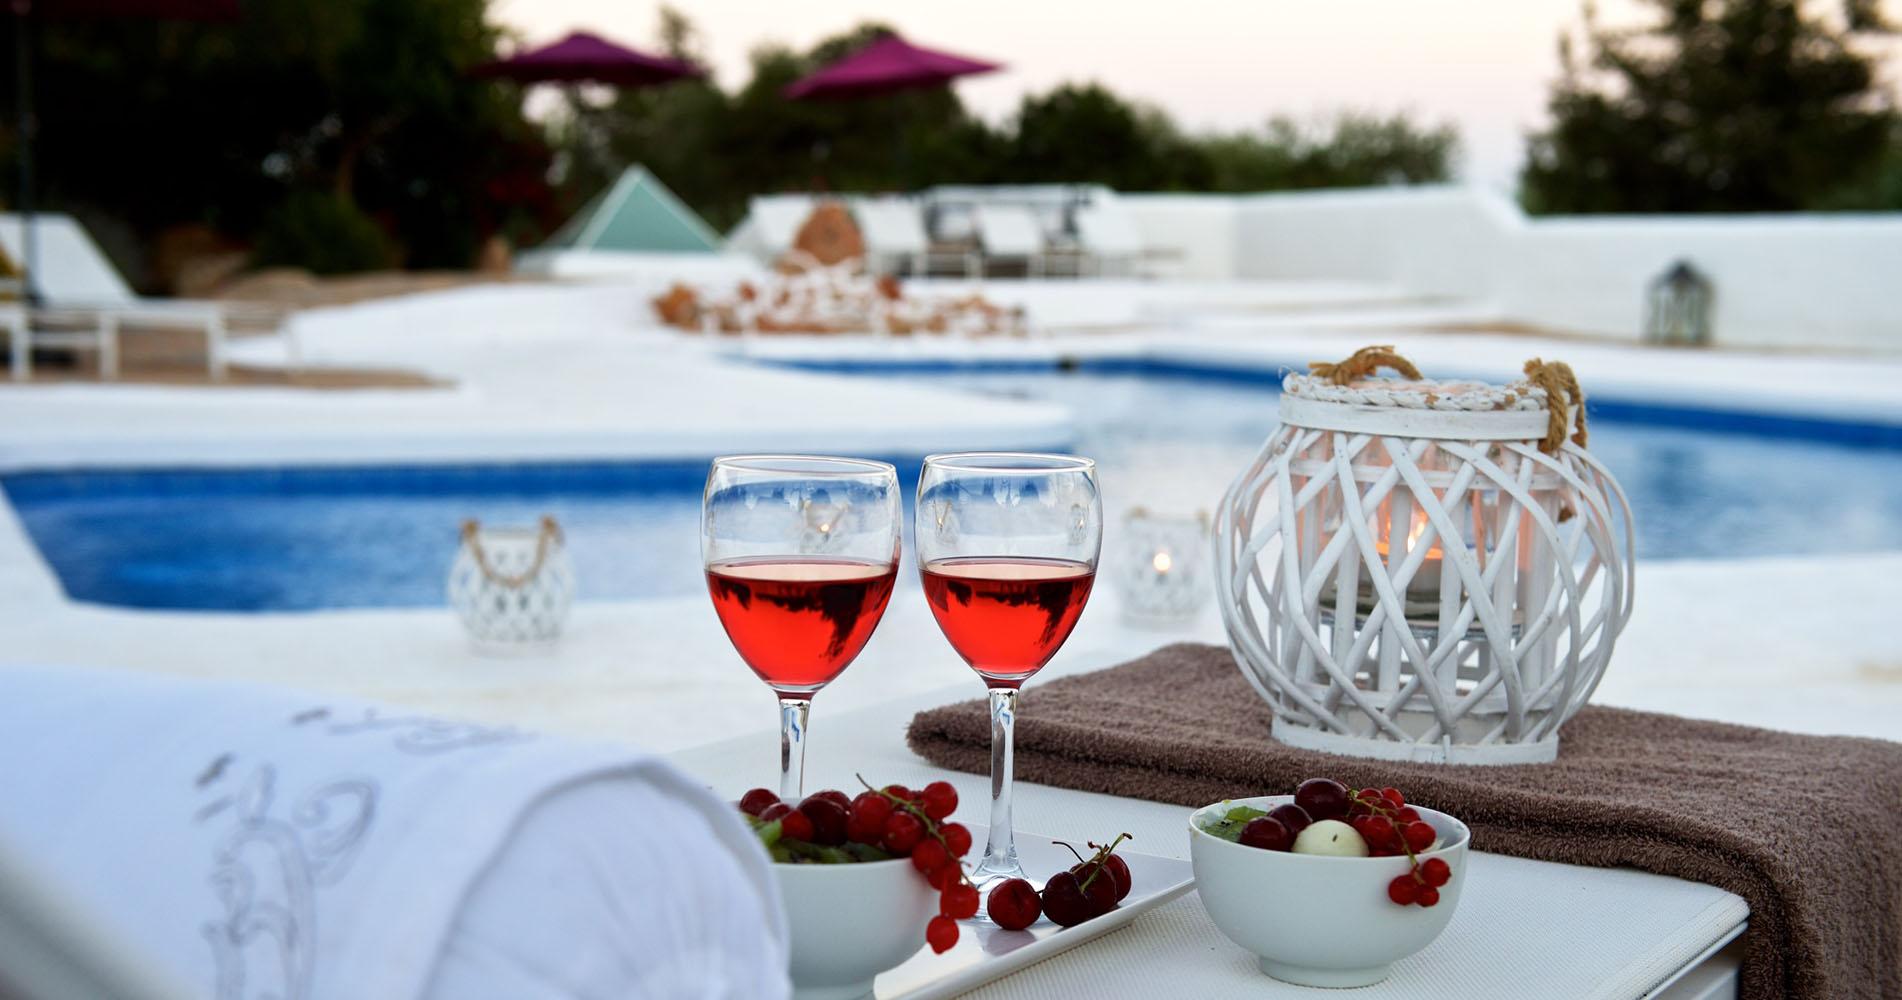 Parramatta Boutique Hotel disfruta de la isla de Ibiza en plena naturaleza